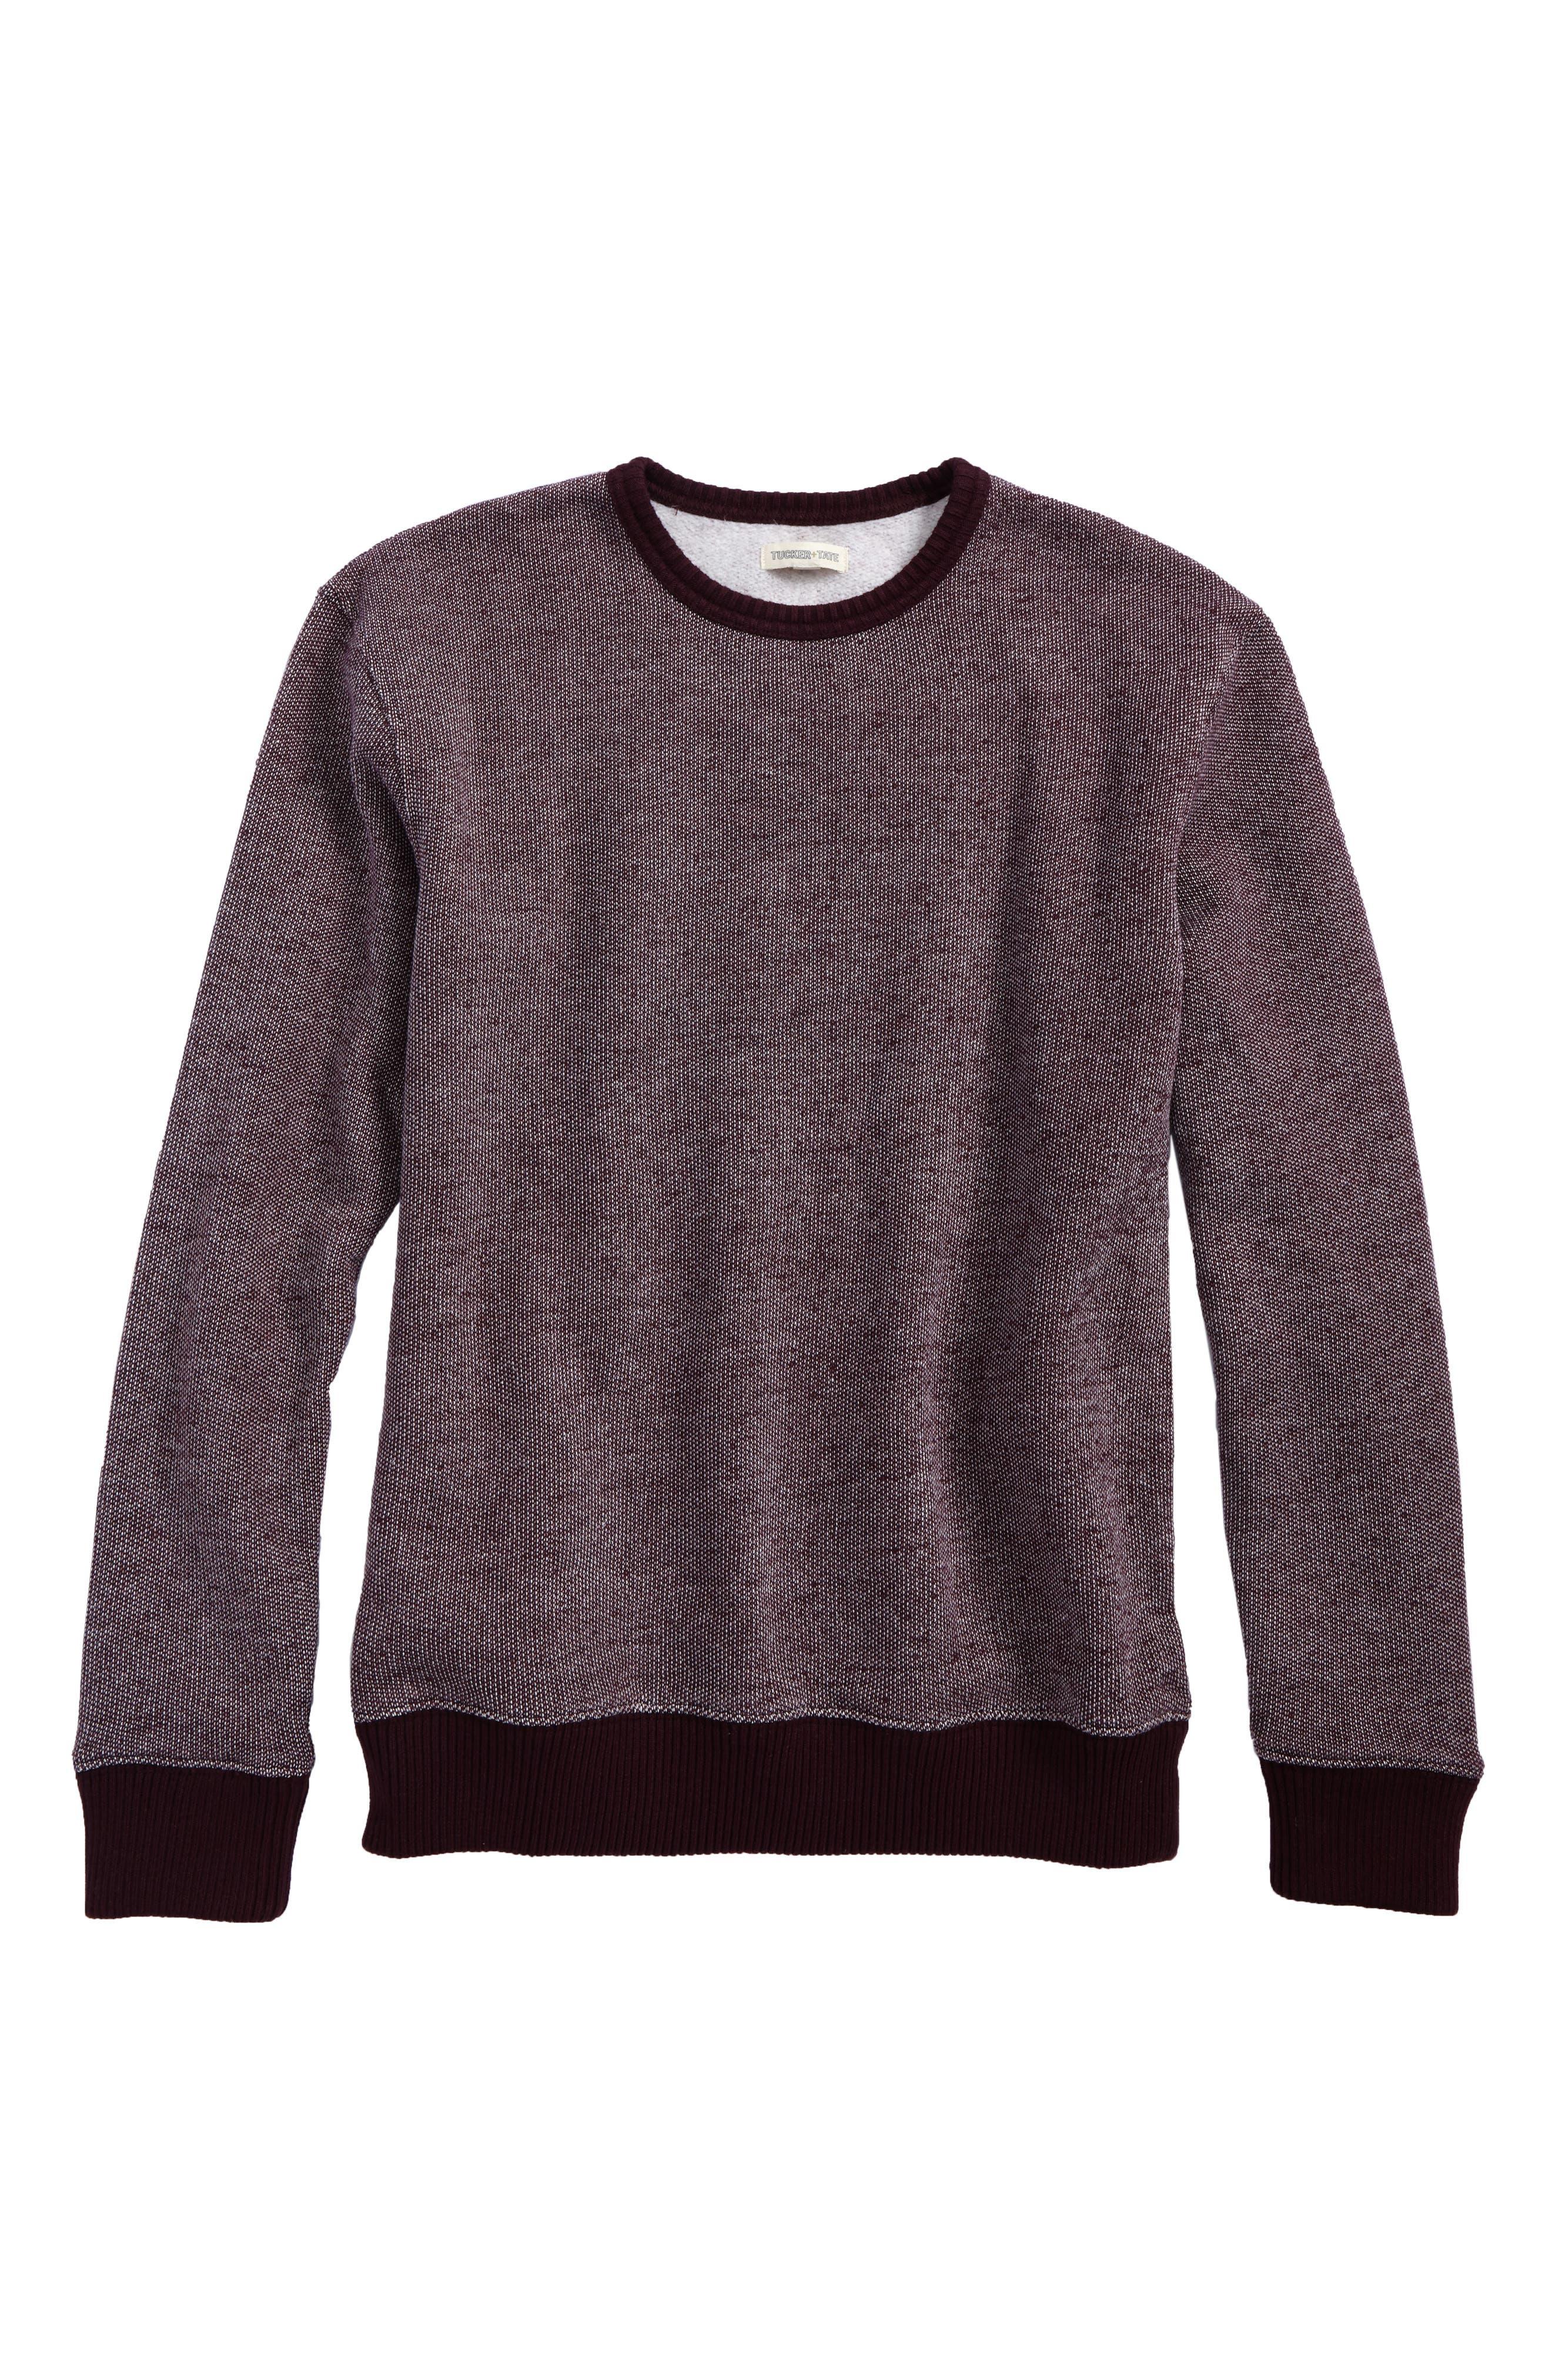 Alternate Image 1 Selected - Tucker + Tate Brushed Fleece Pullover (Big Boys)